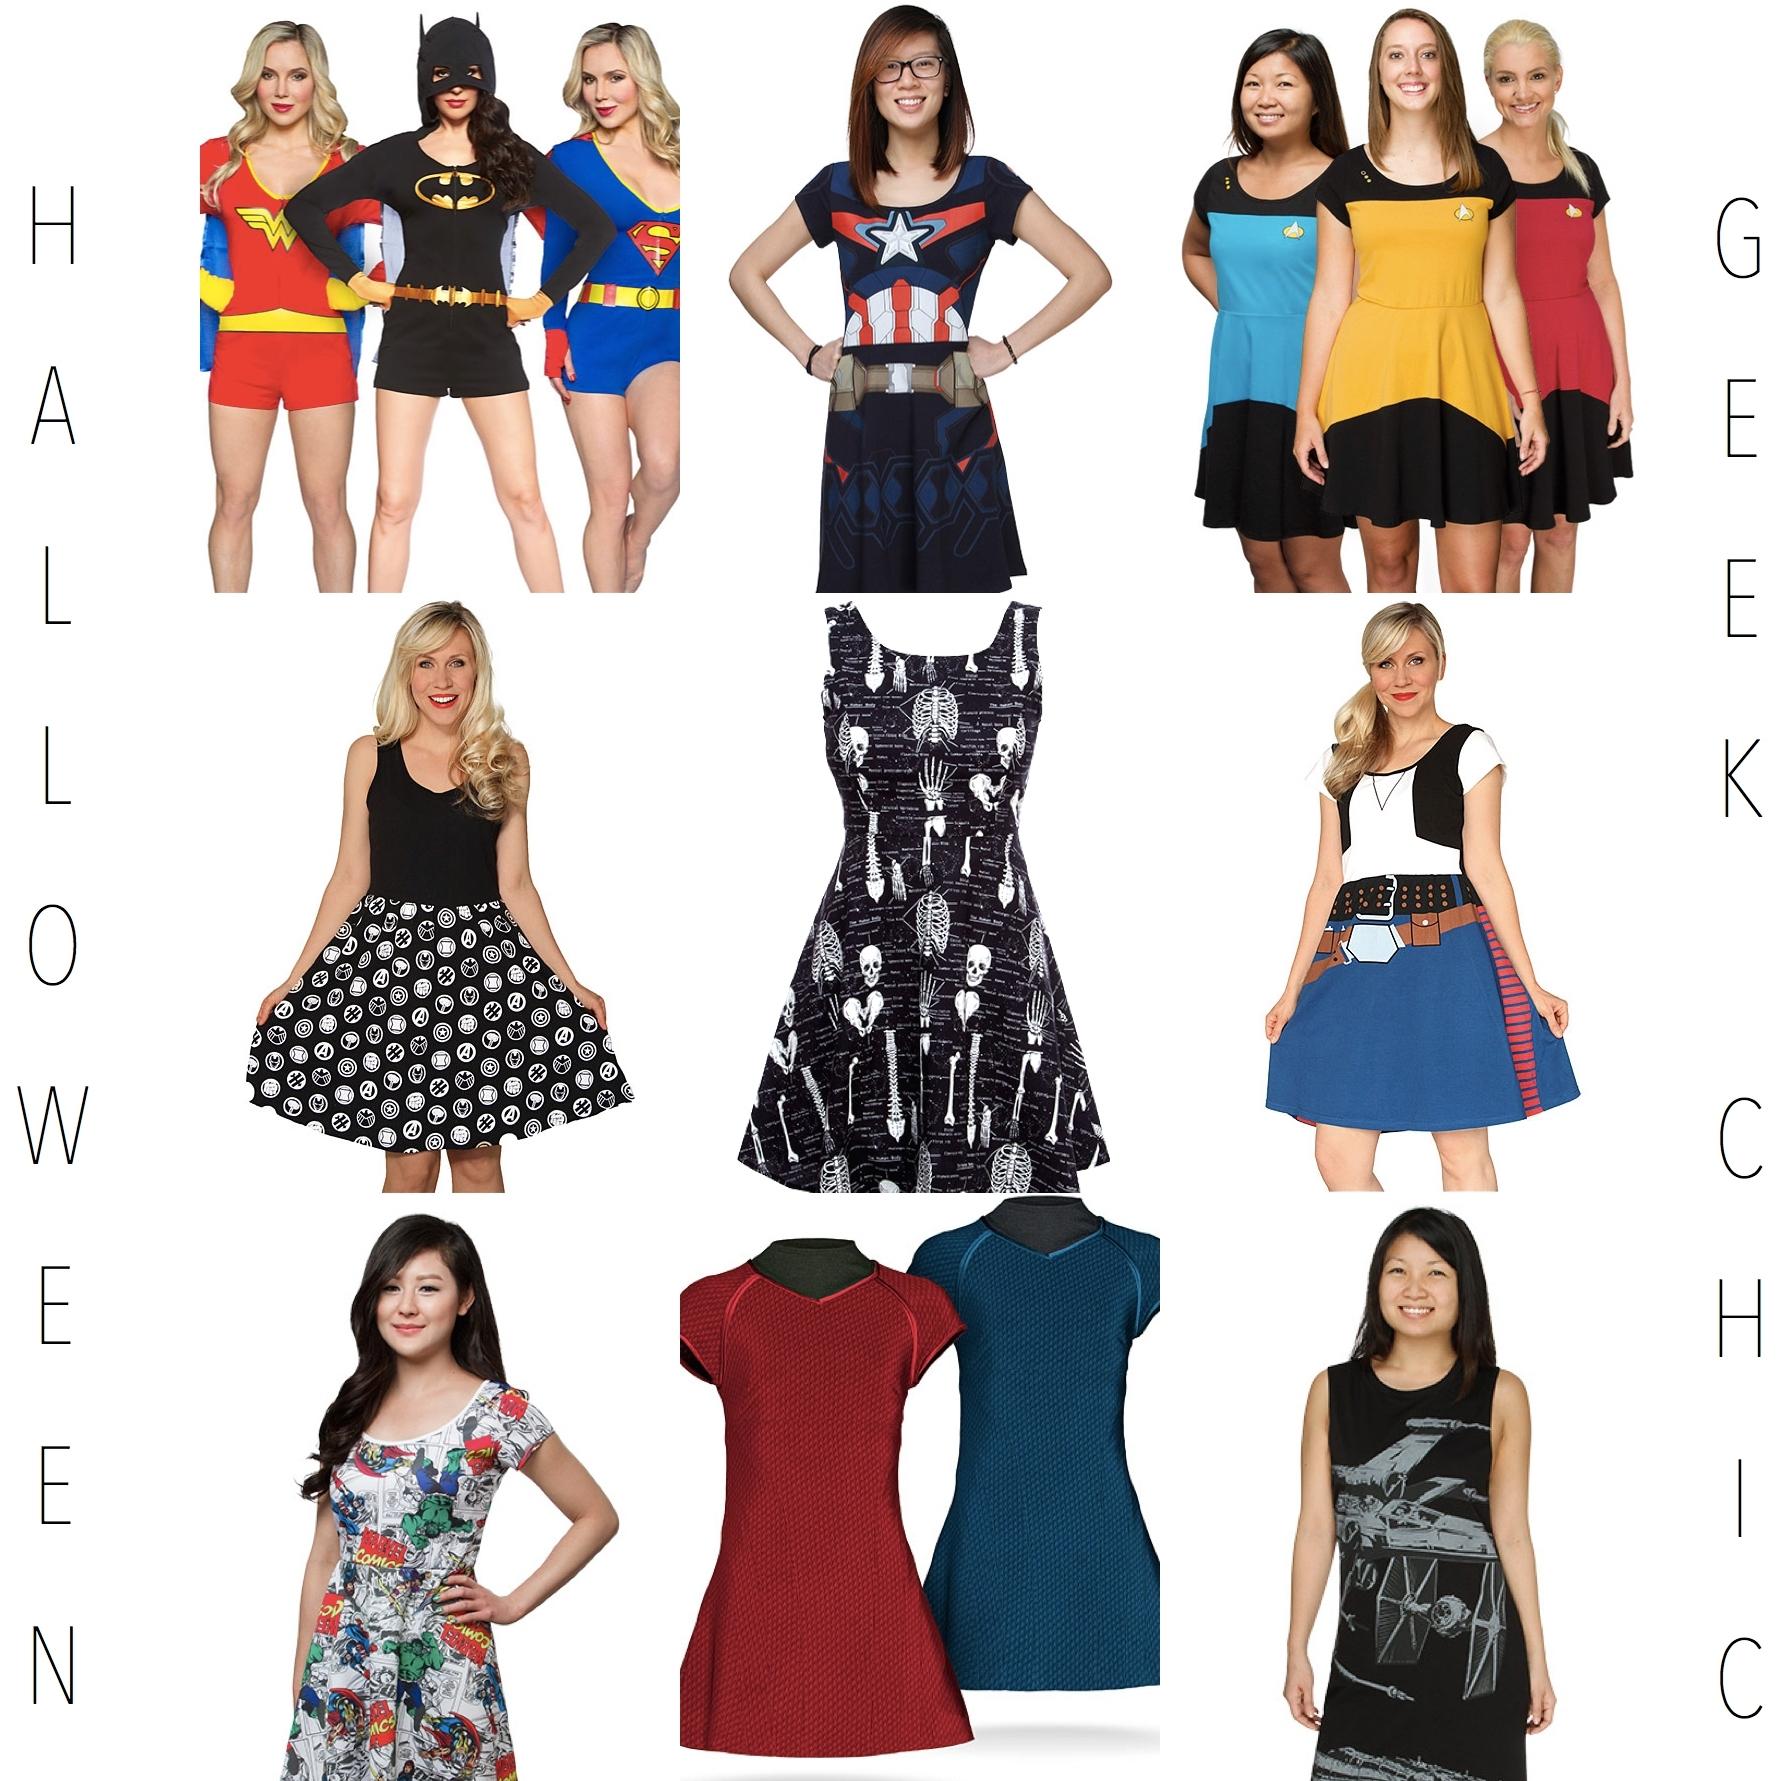 10 cute easy halloween costume ideas for teenage girls 10 cute easy halloween costume ideas for teenage girls name solutioingenieria Gallery